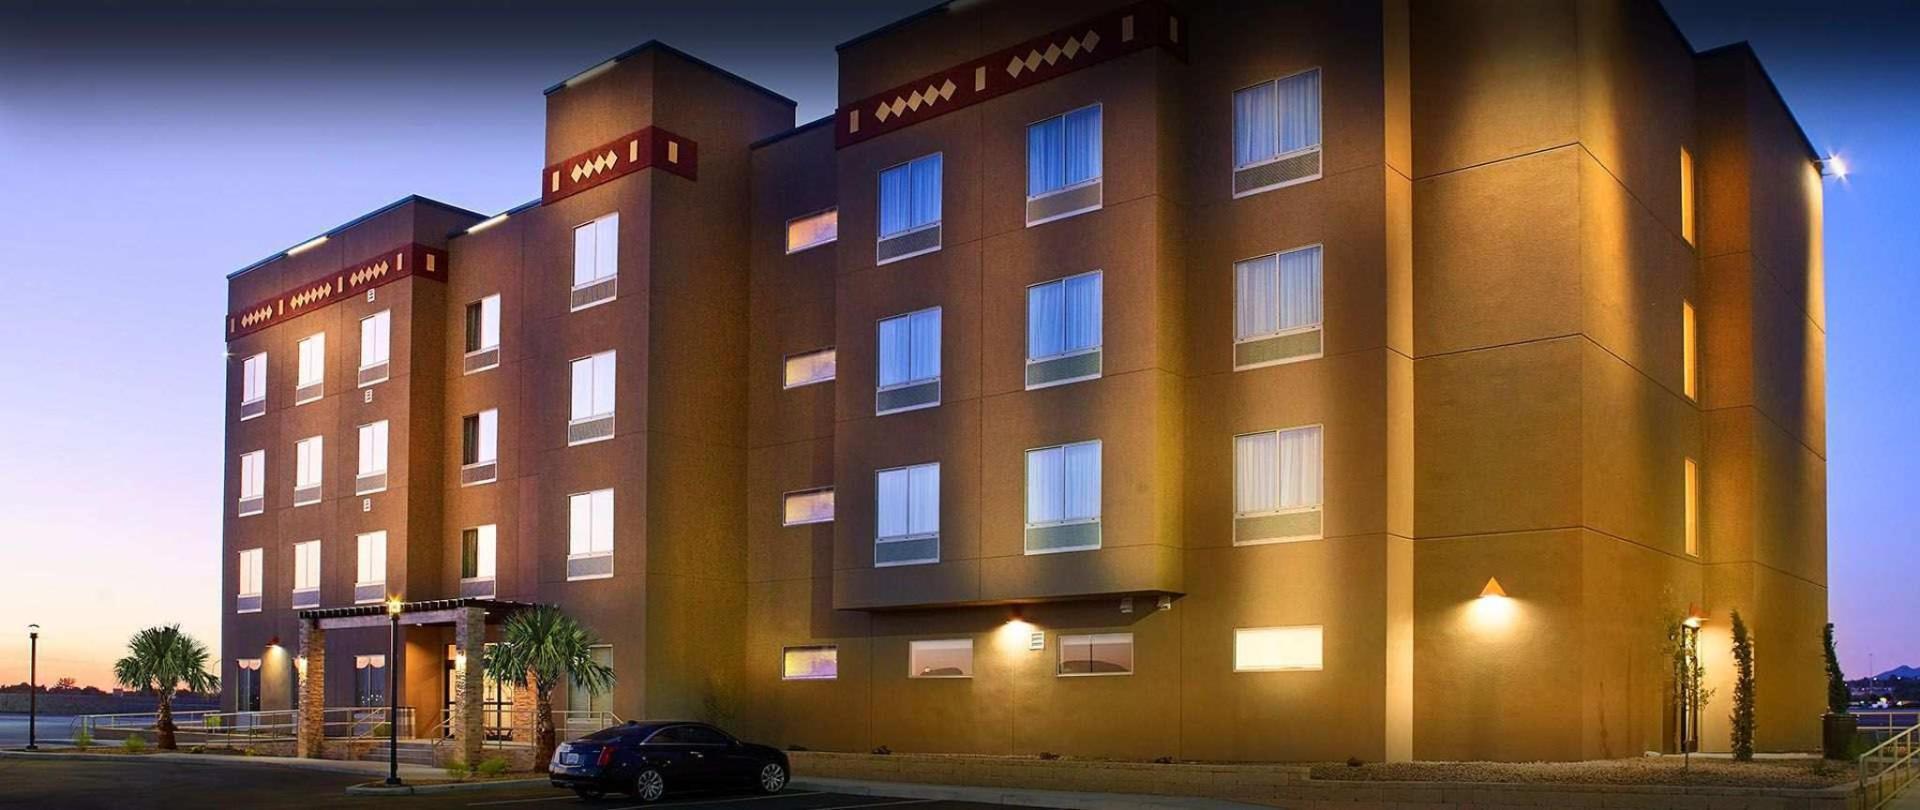 hotel-front-exterior-2.jpg.1920x810_default.jpeg.1920x0.jpeg